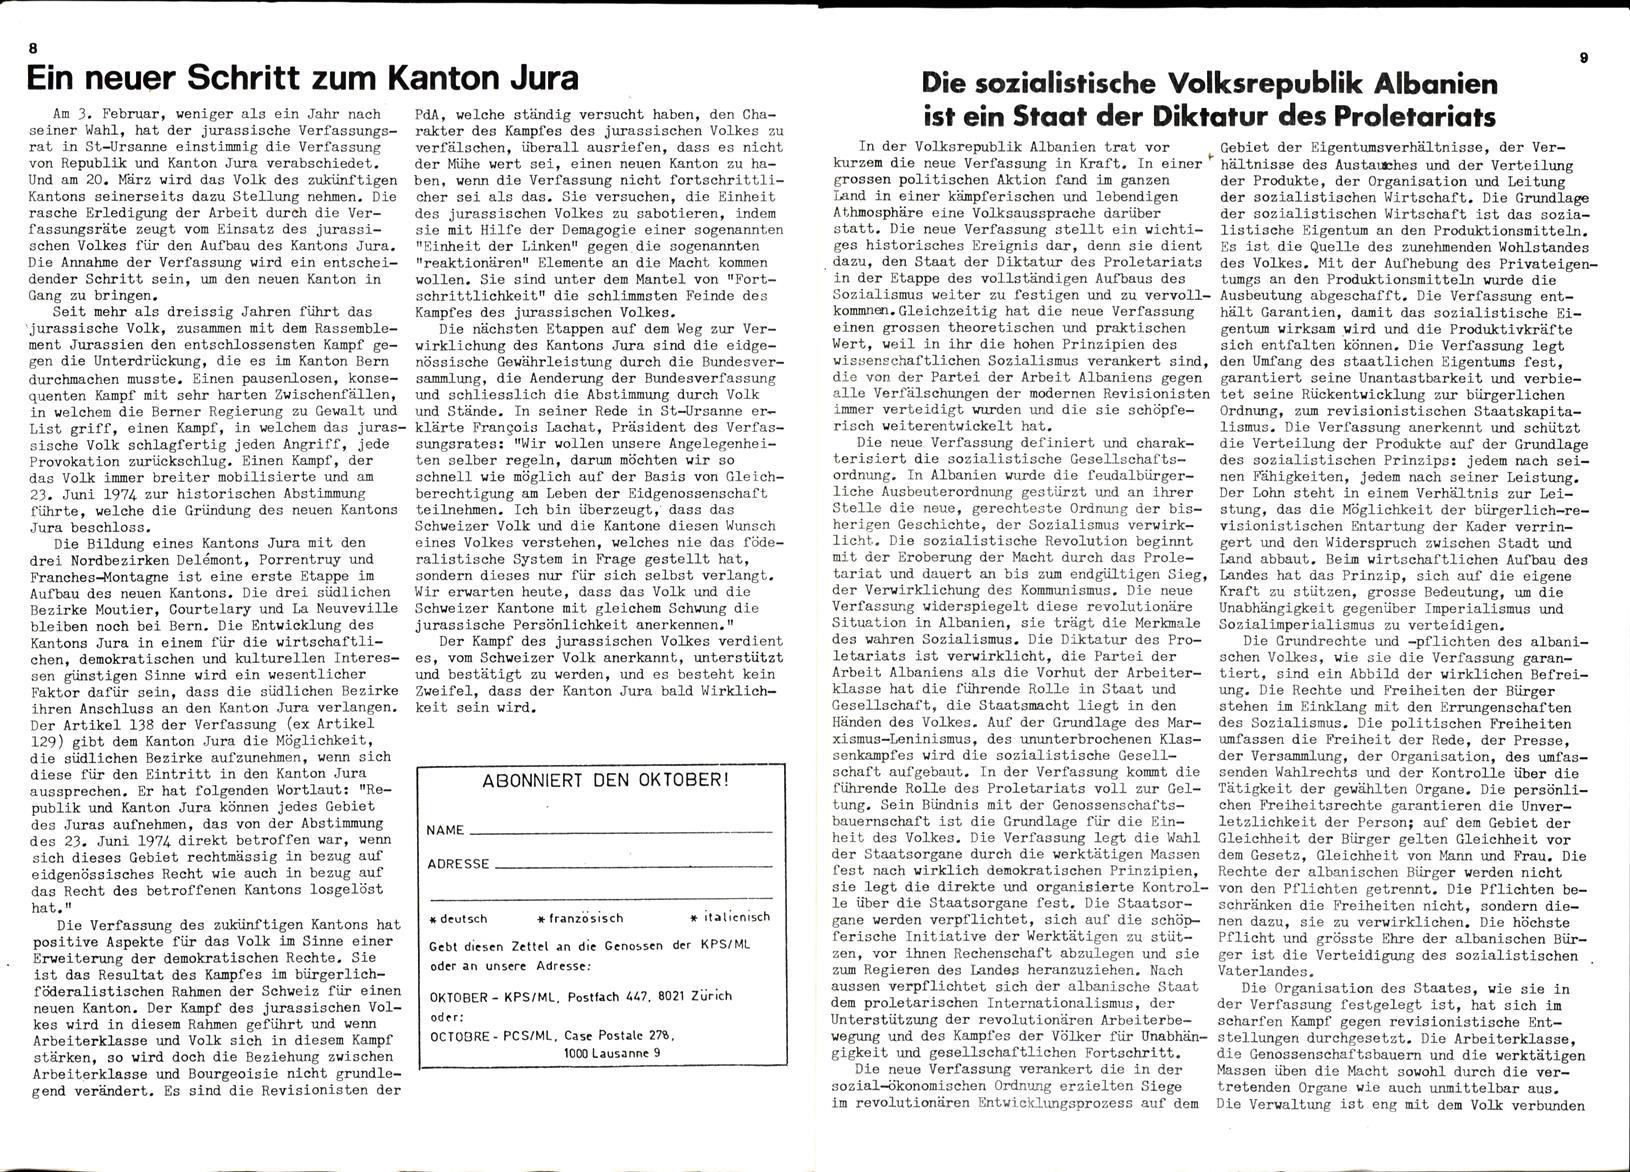 Schweiz_KPSML_Oktober_19770300_108_005